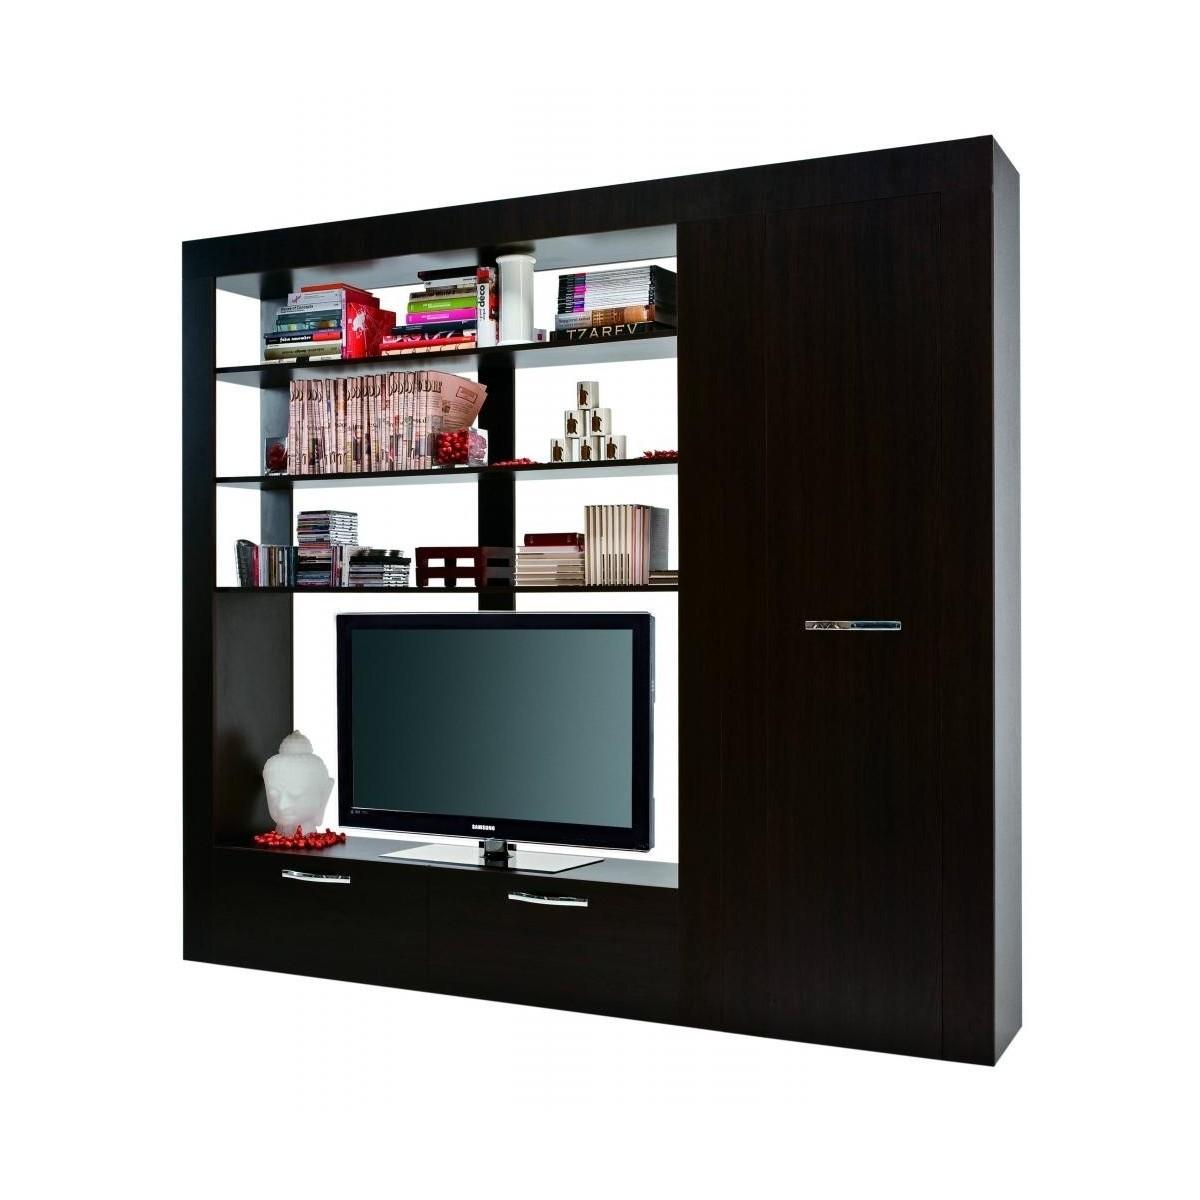 Awesome mobile tv soggiorno photos idee arredamento casa - Libreria mobile tv ...